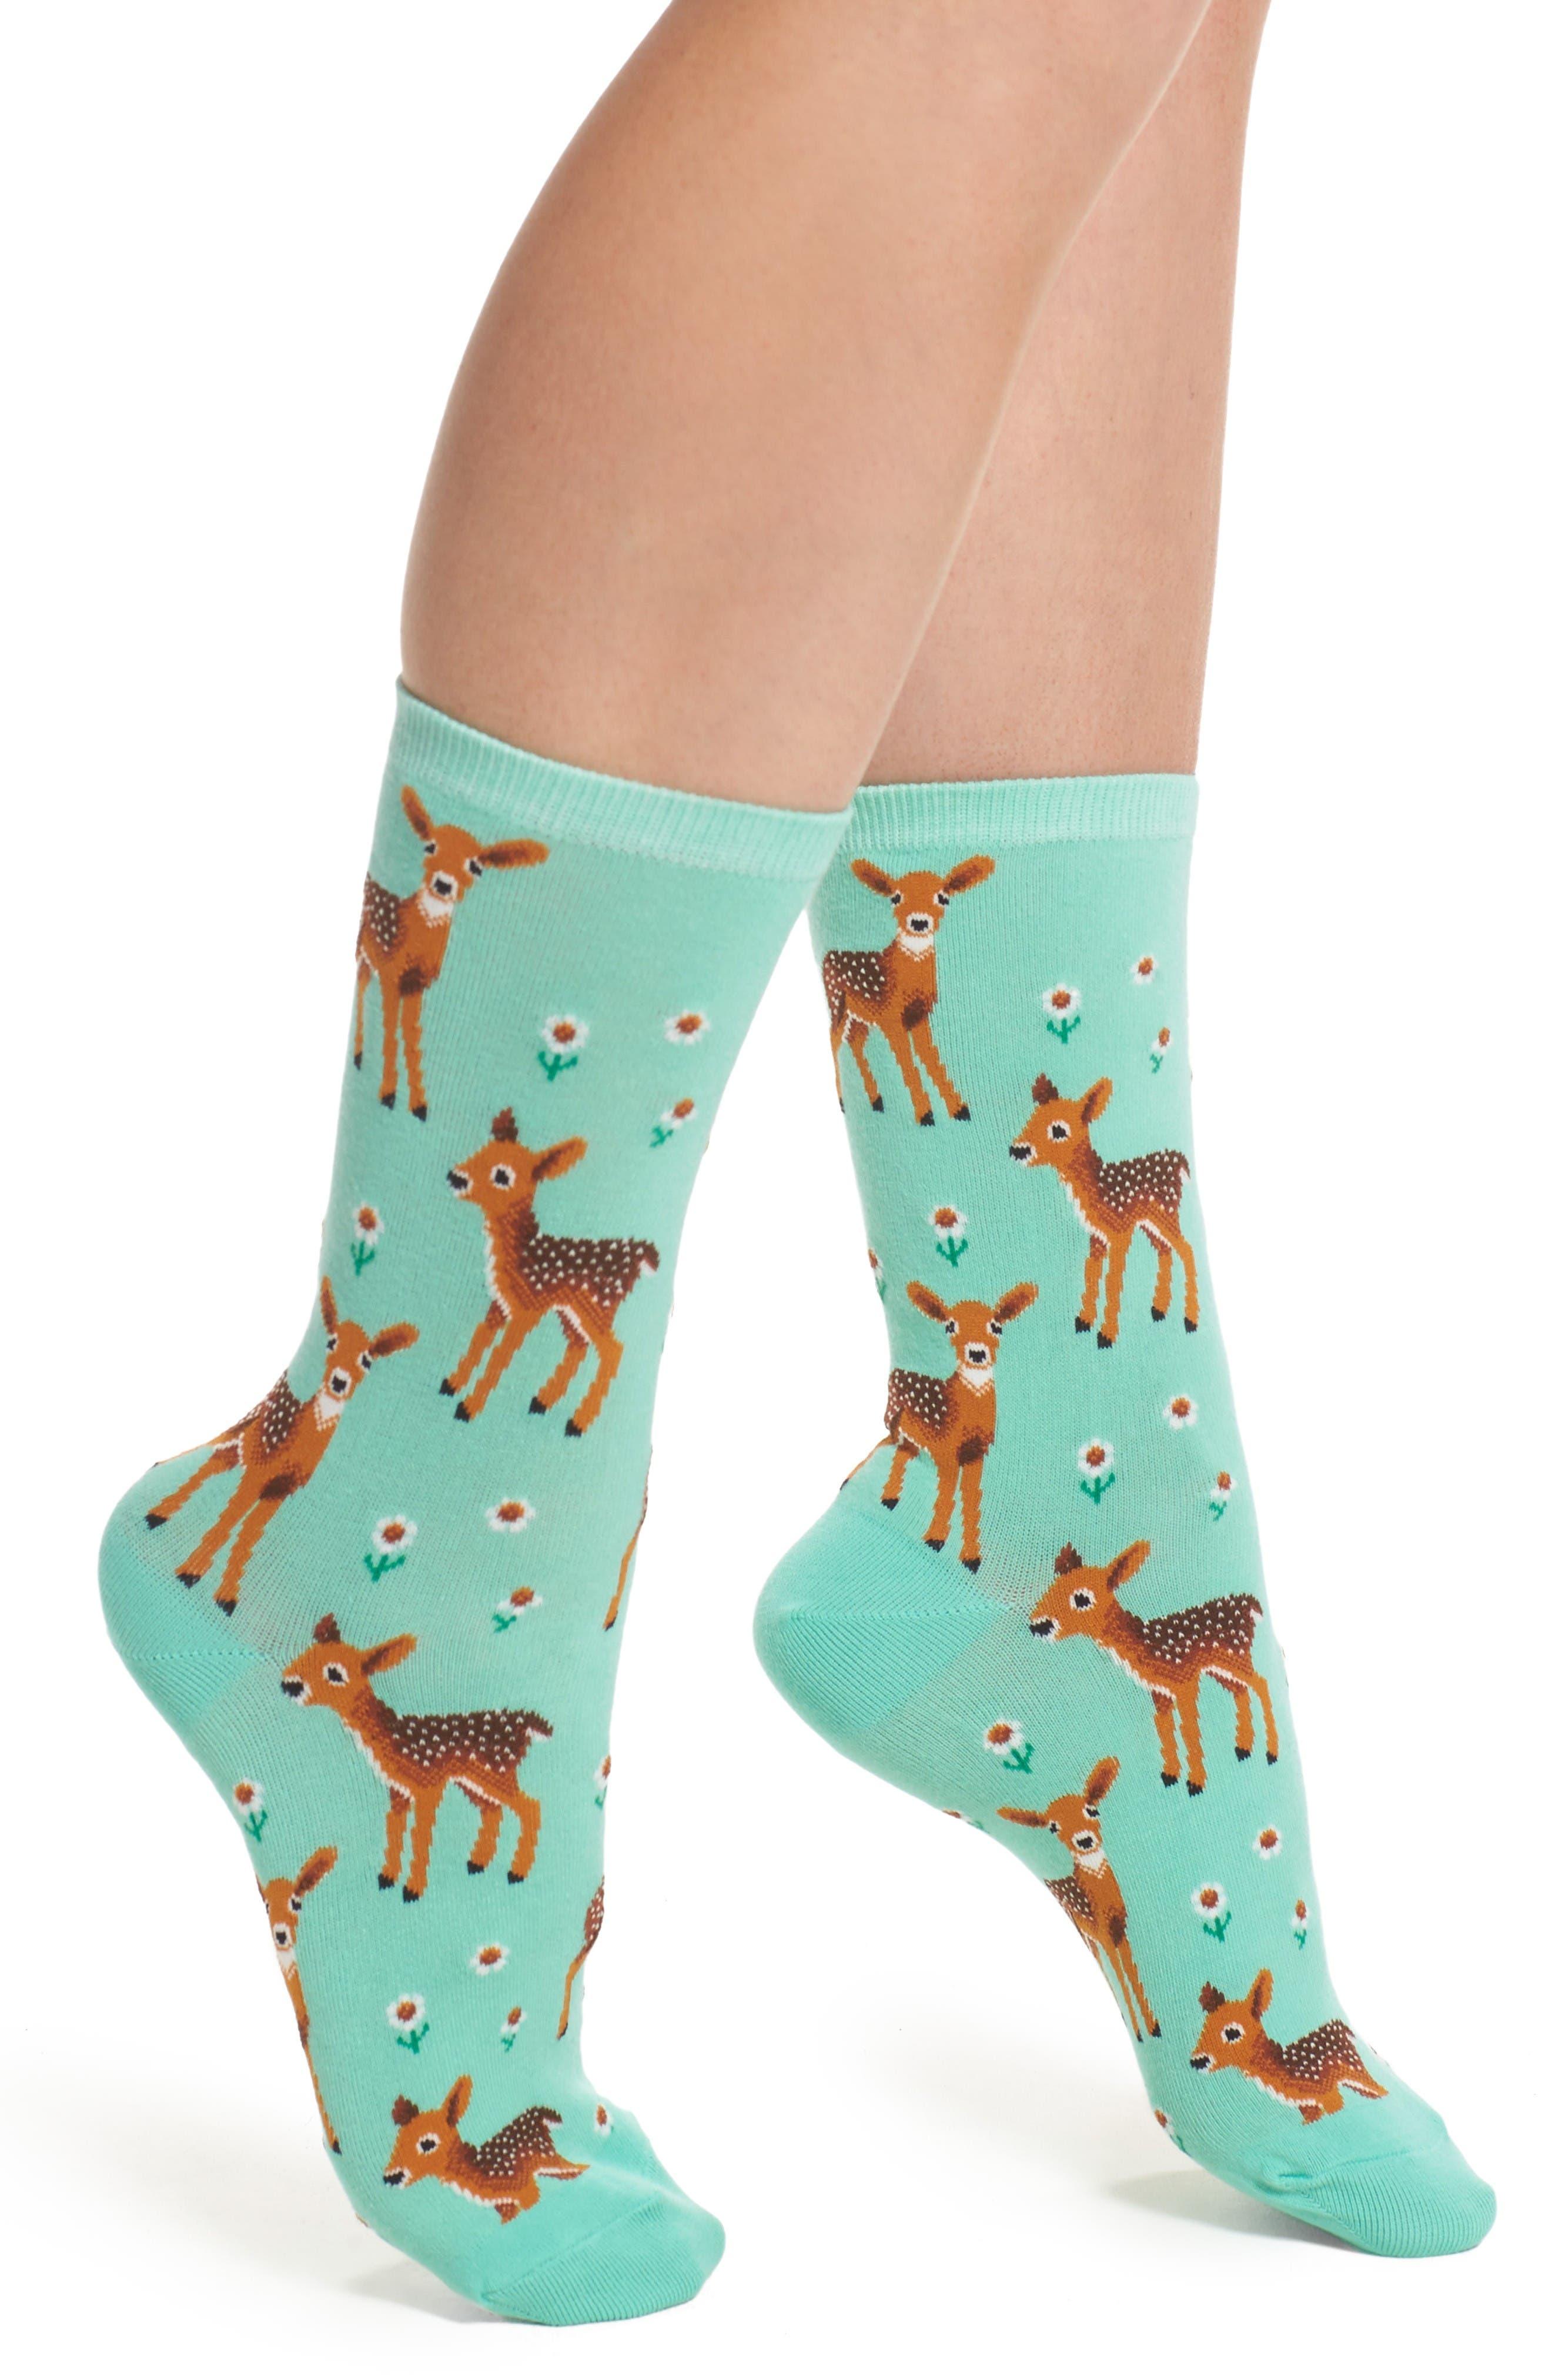 Alternate Image 1 Selected - Hot Sox Spring Deer Crew Socks (3 for $15)